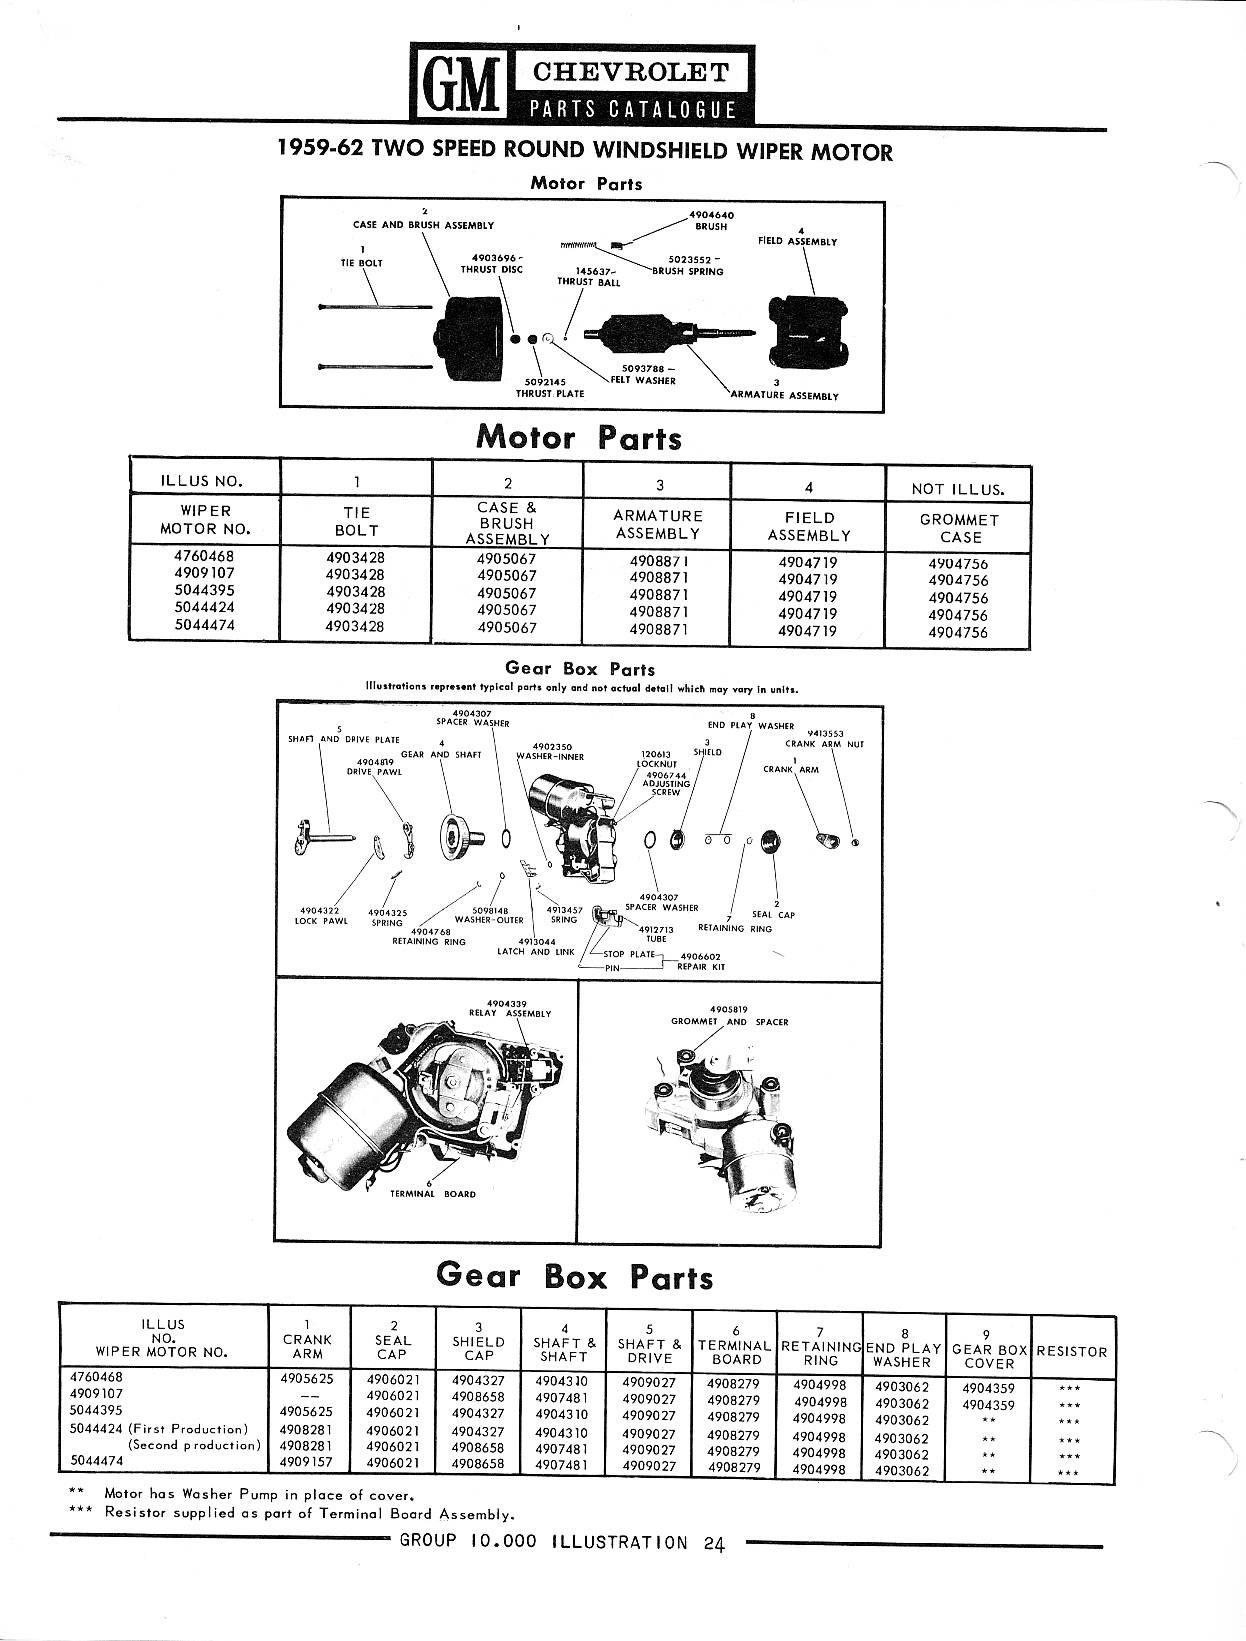 1958-1968 Chevrolet Parts Catalog / Image134.jpg